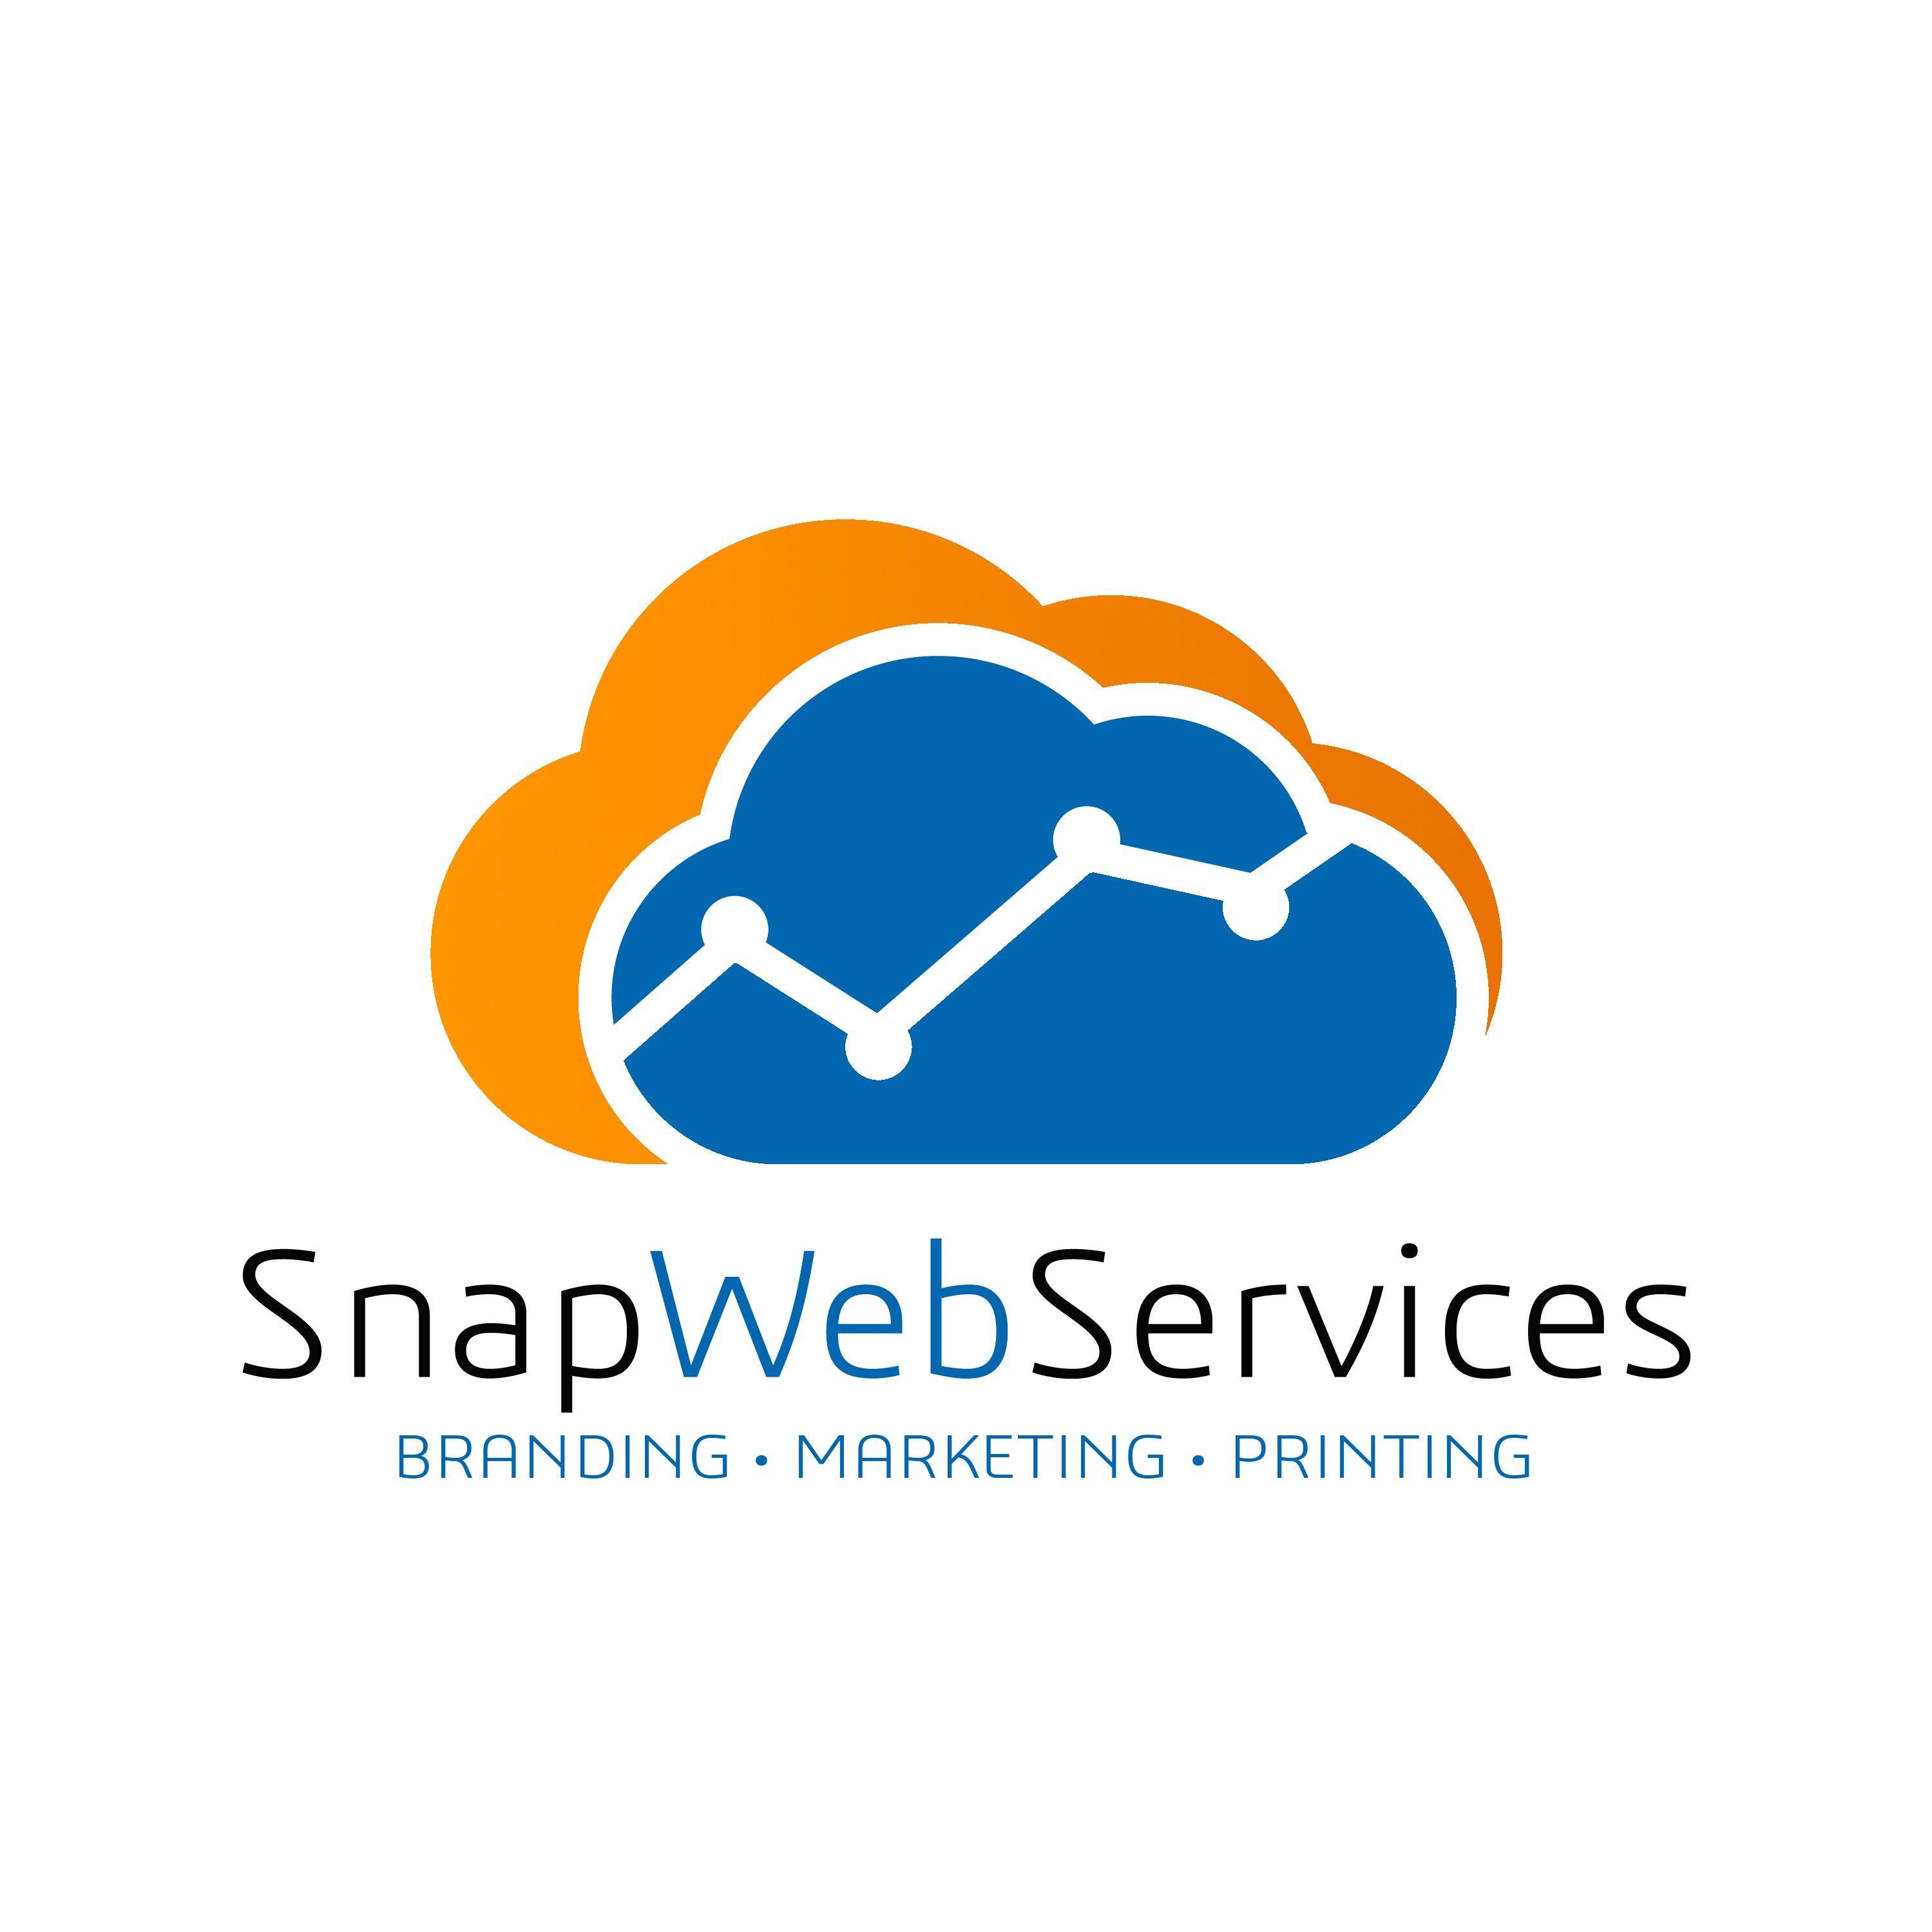 SnapWeb Services